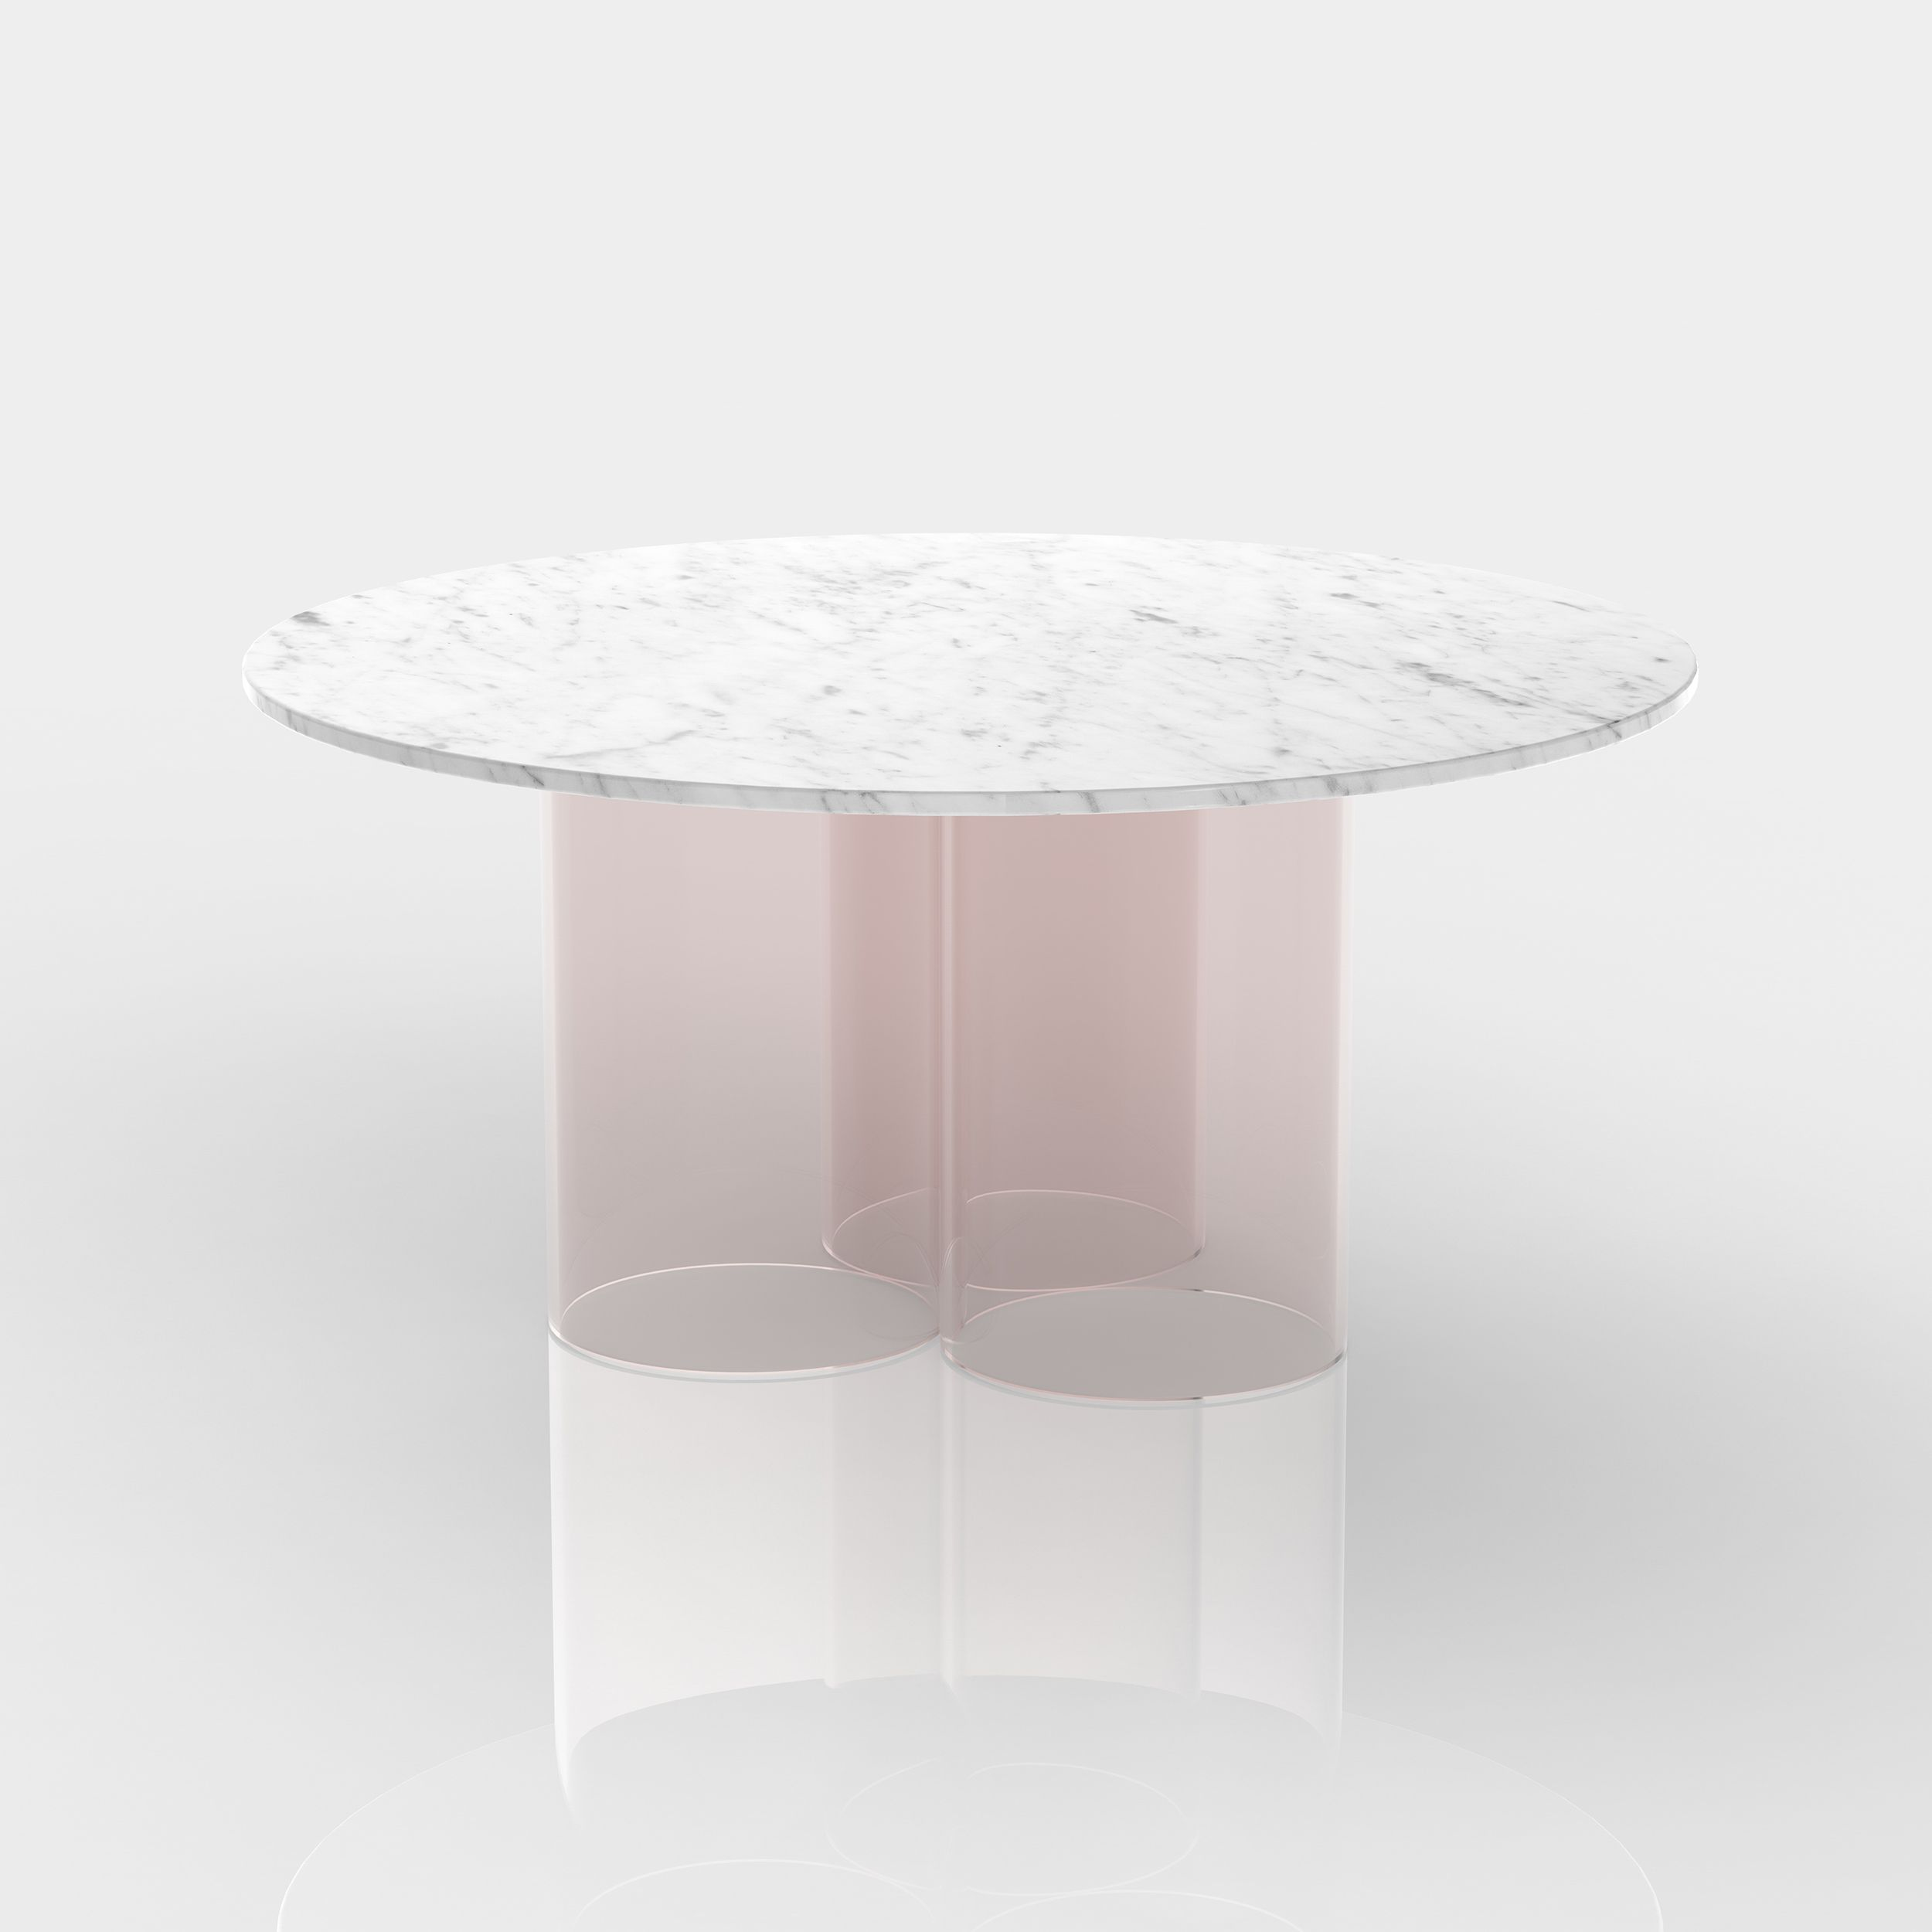 Nunki Round Coffee Table Round Coffee Table Coffee Table Glass